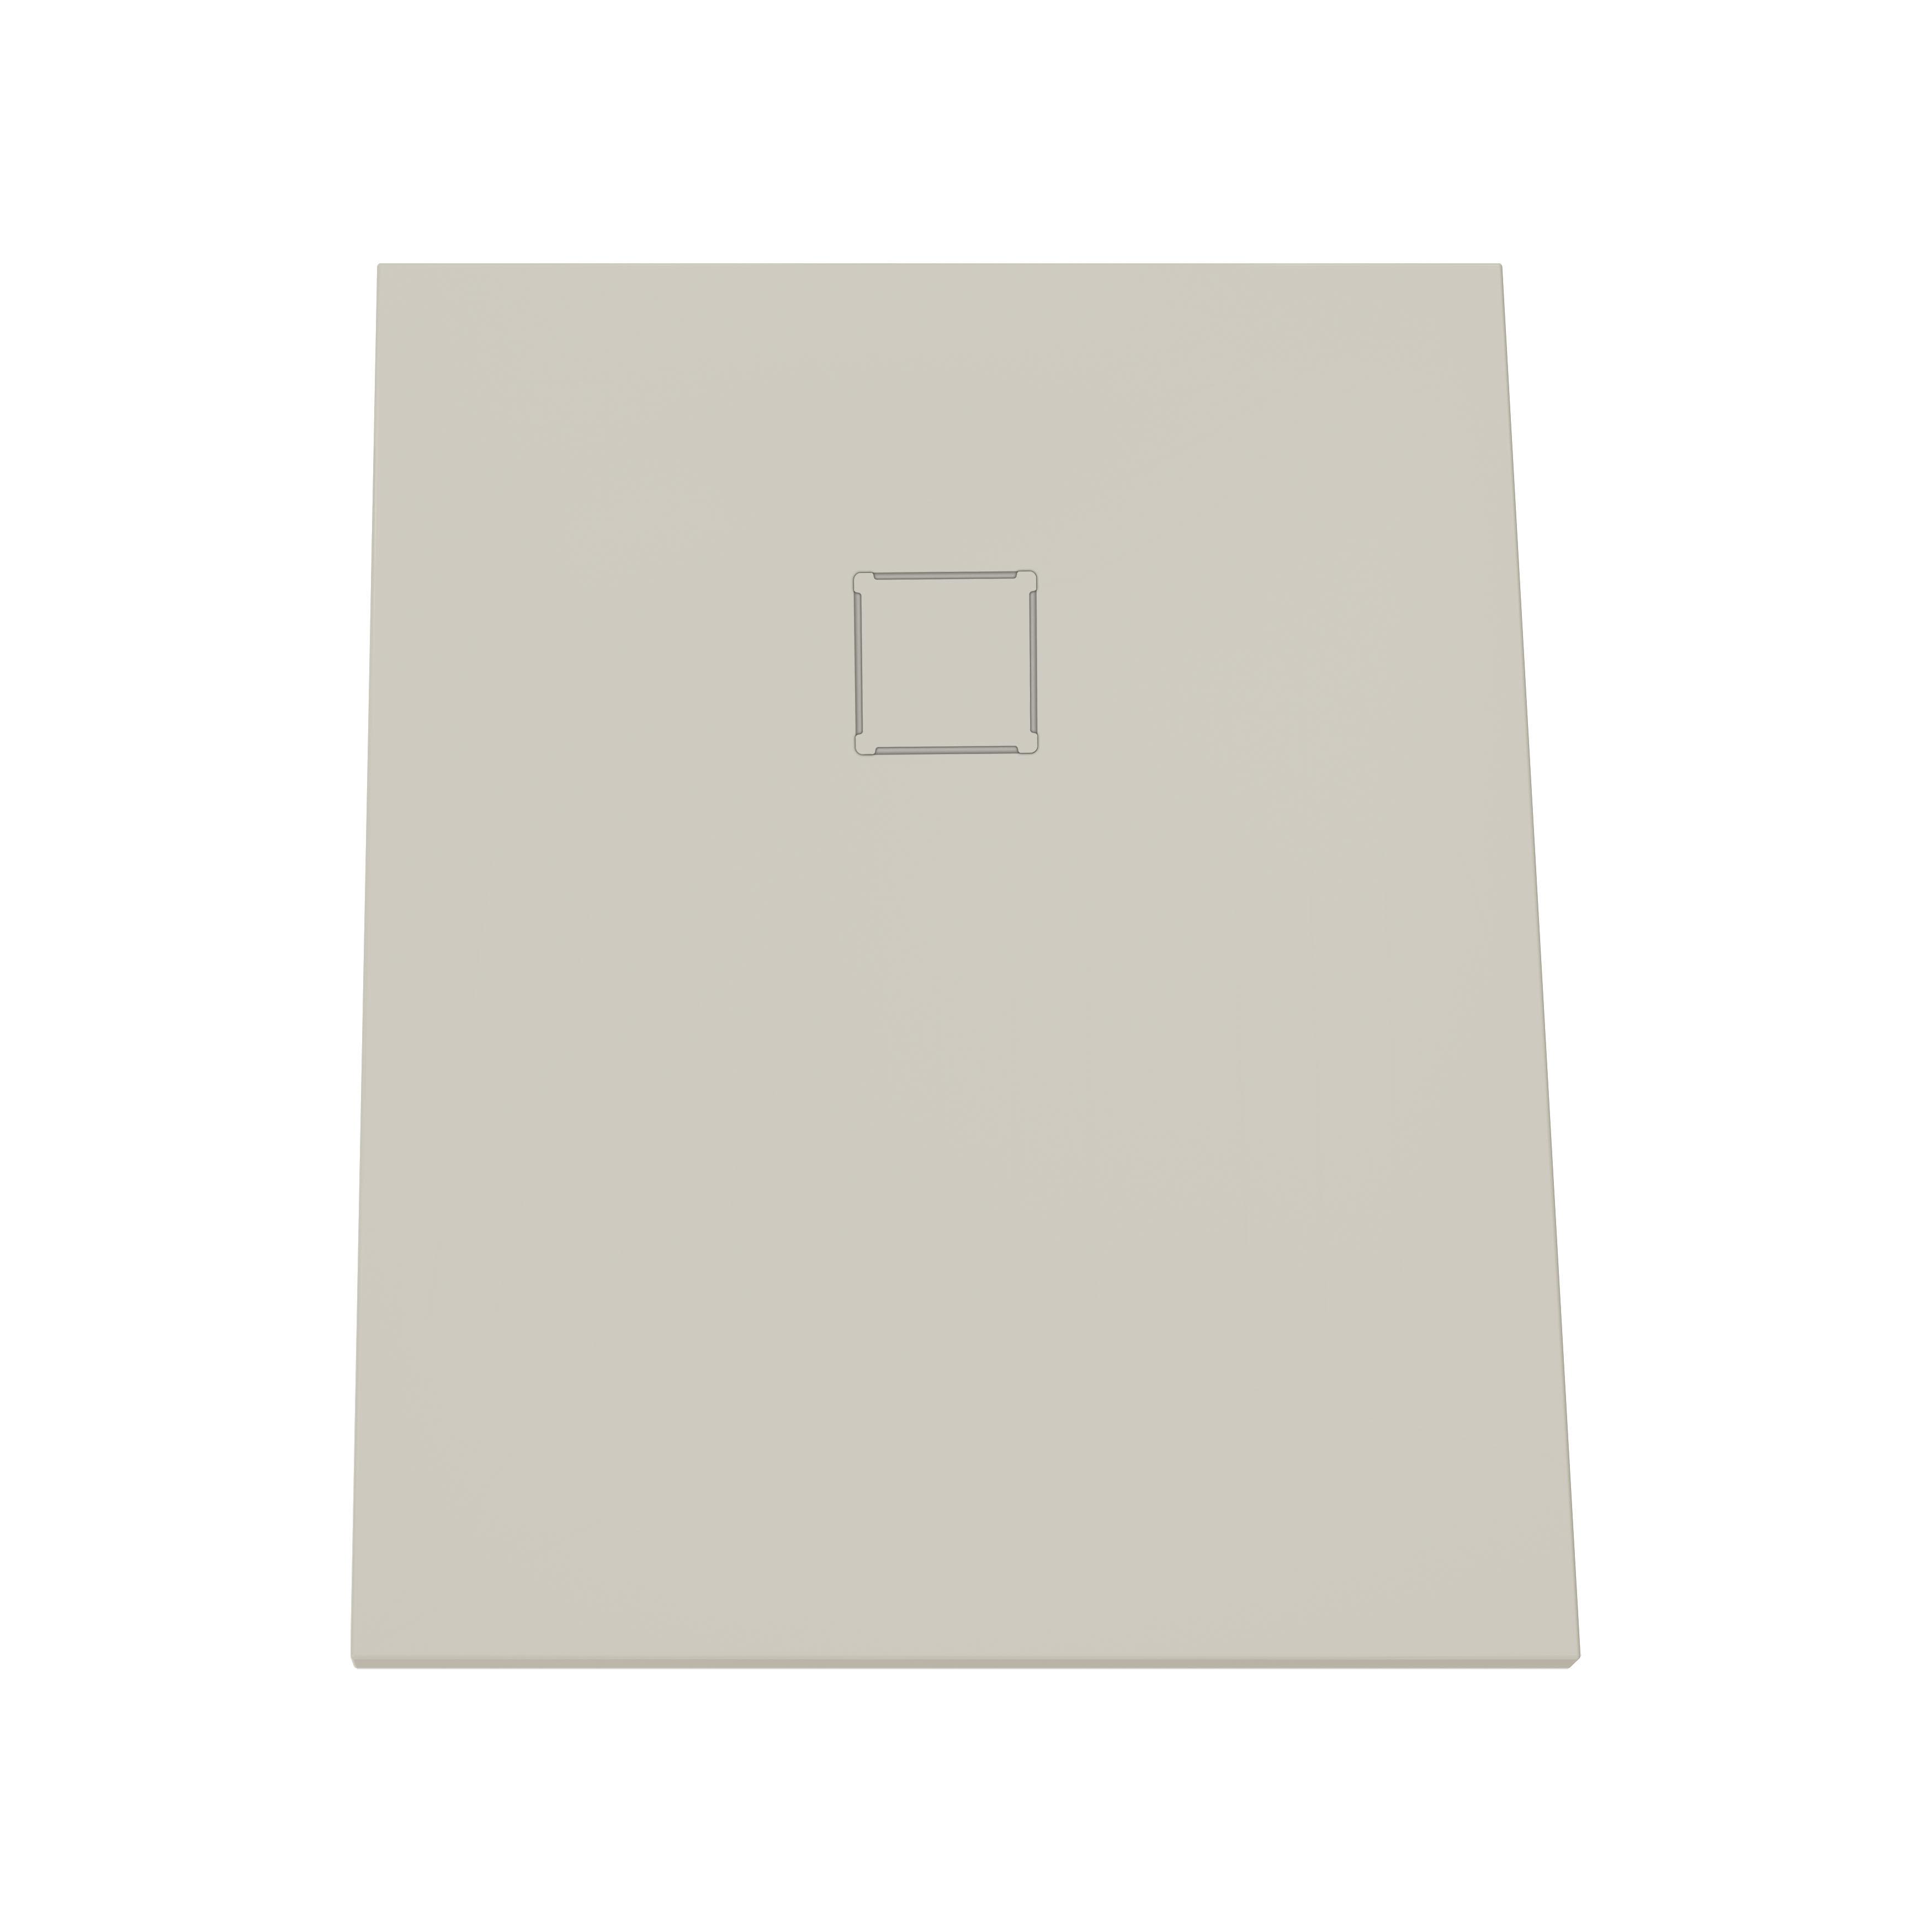 V-stone, receveur ultra plat en solid stone, 100  x  70 cm, taupe